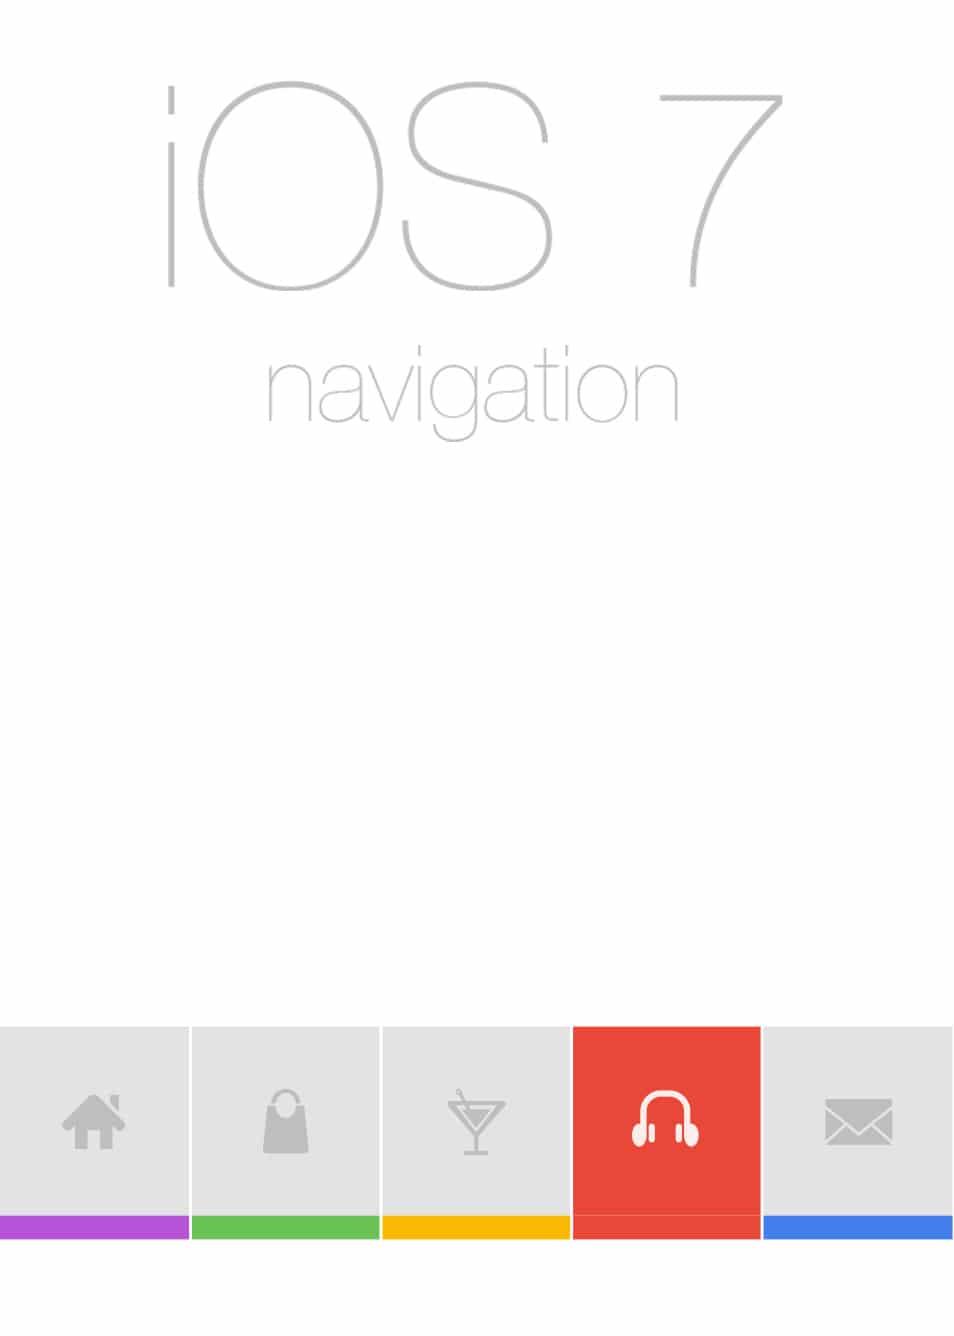 Flat iOS7 Navigation